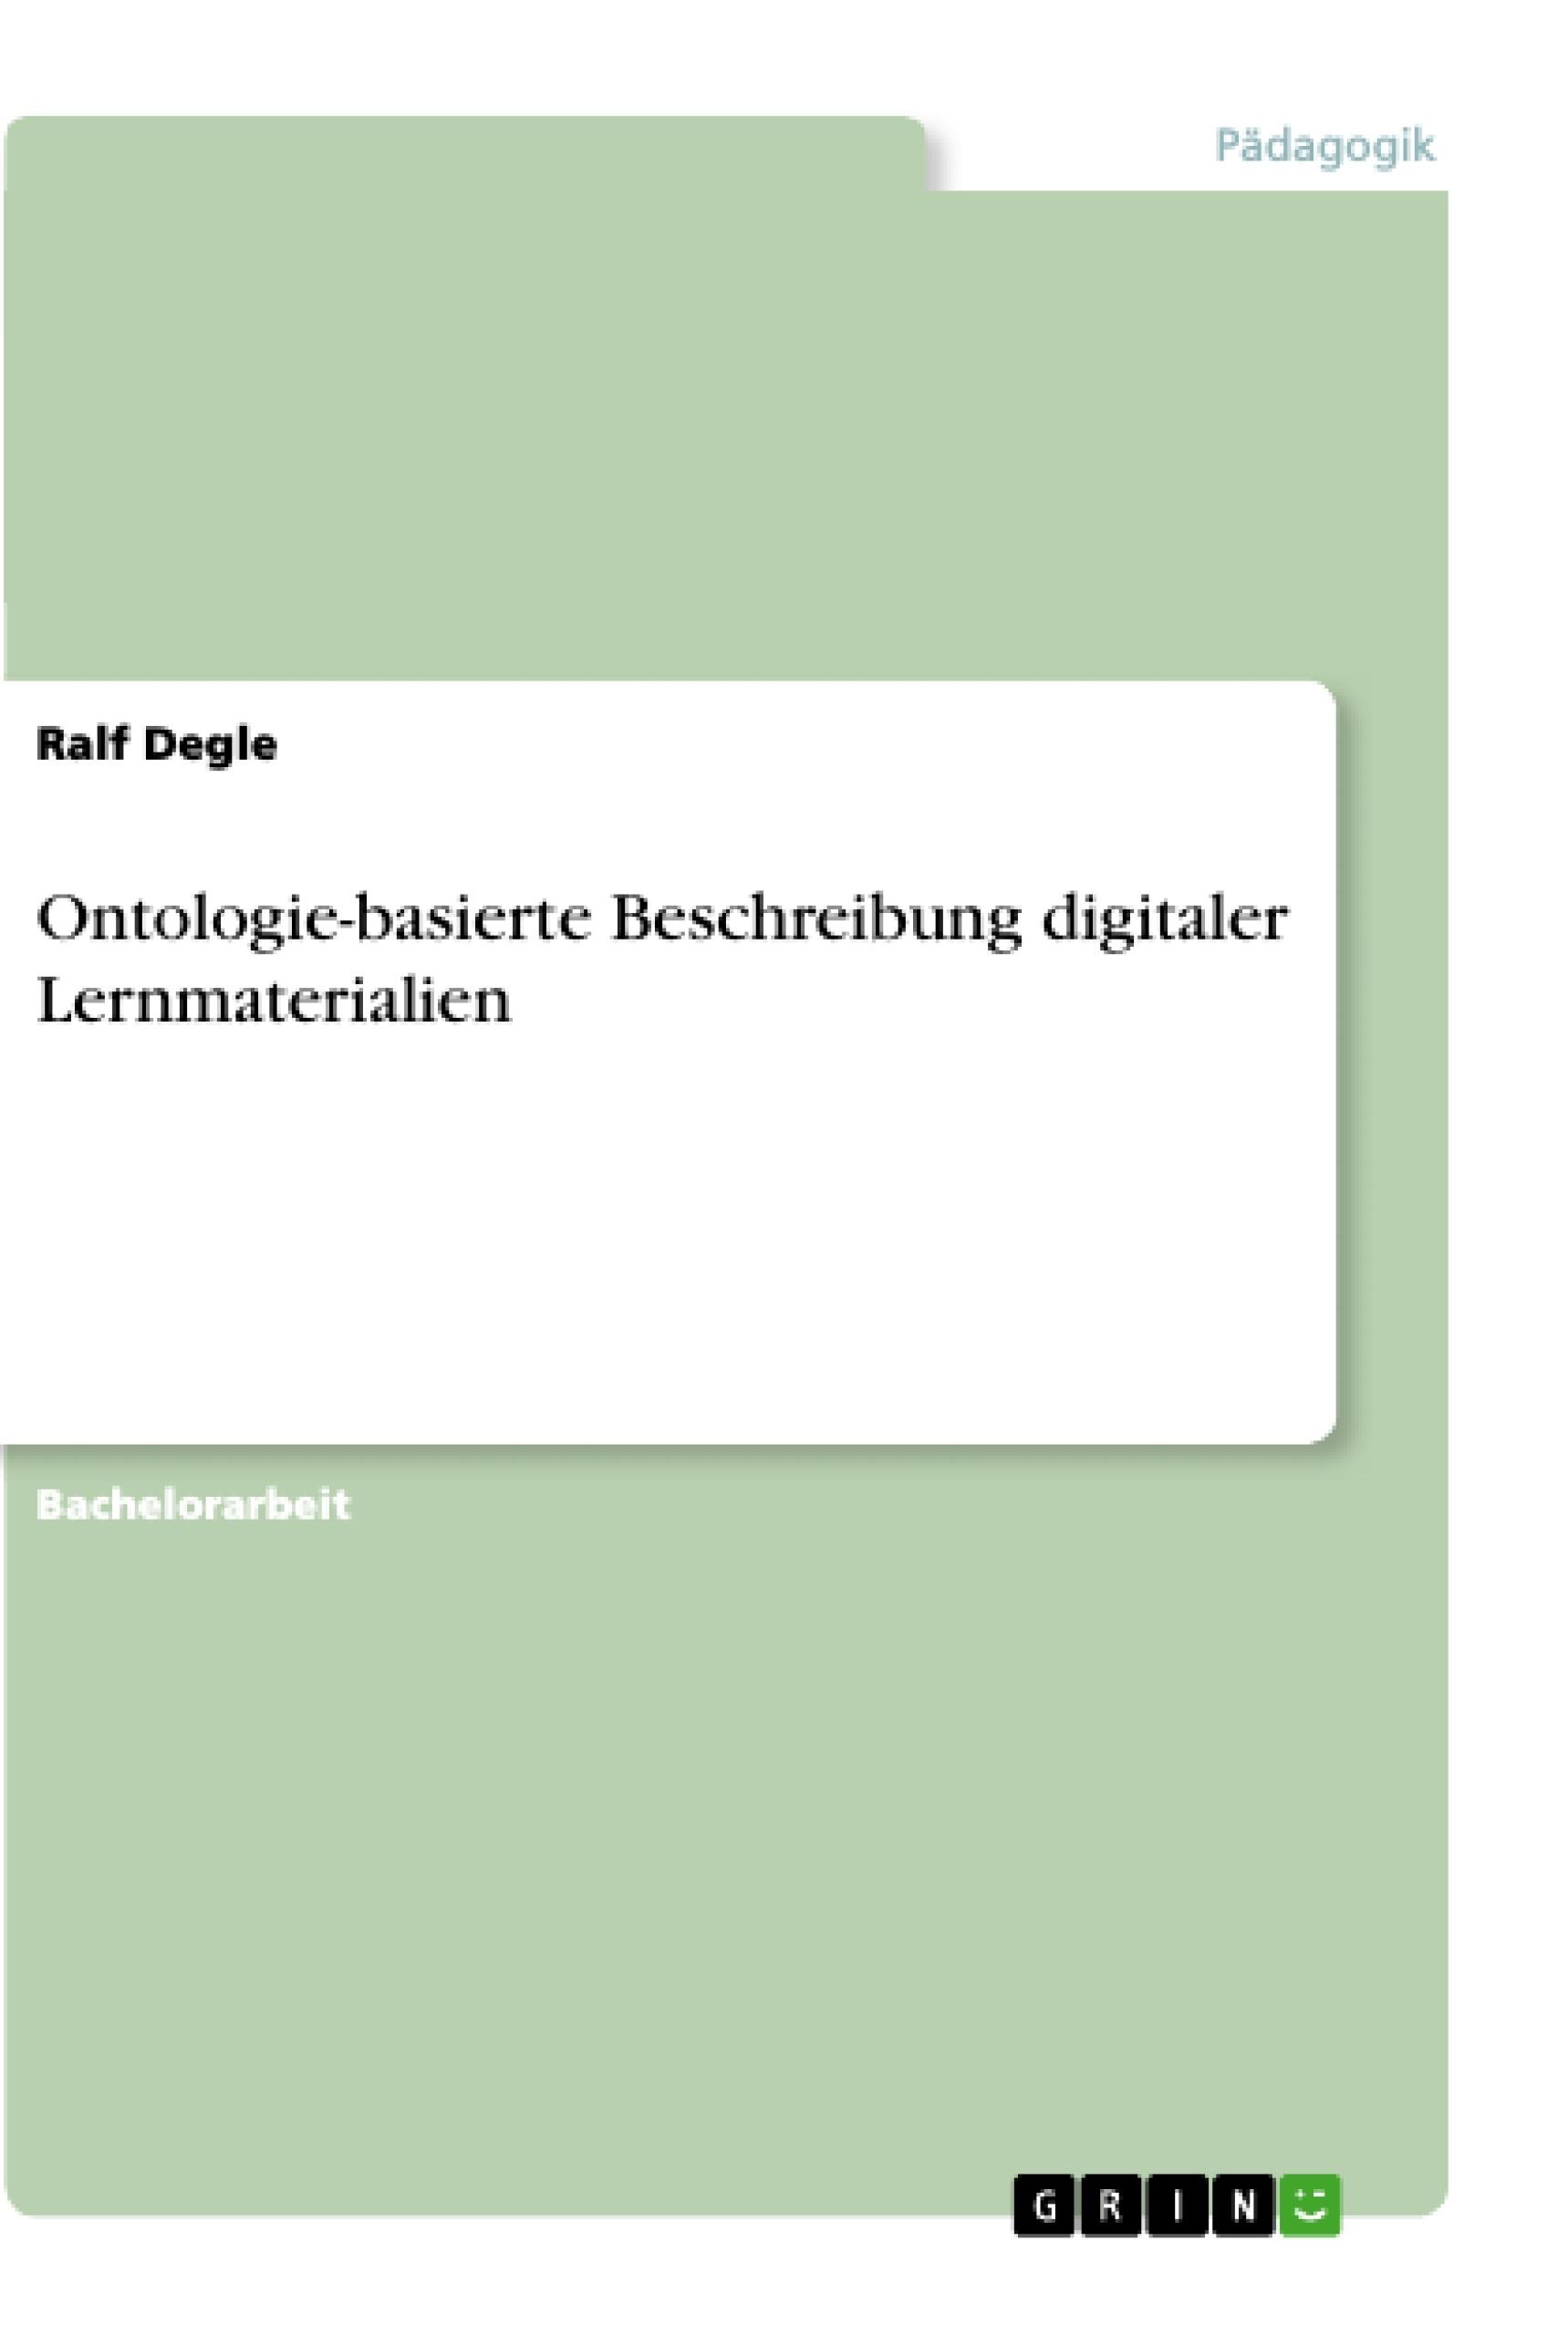 Titel: Ontologie-basierte Beschreibung digitaler Lernmaterialien